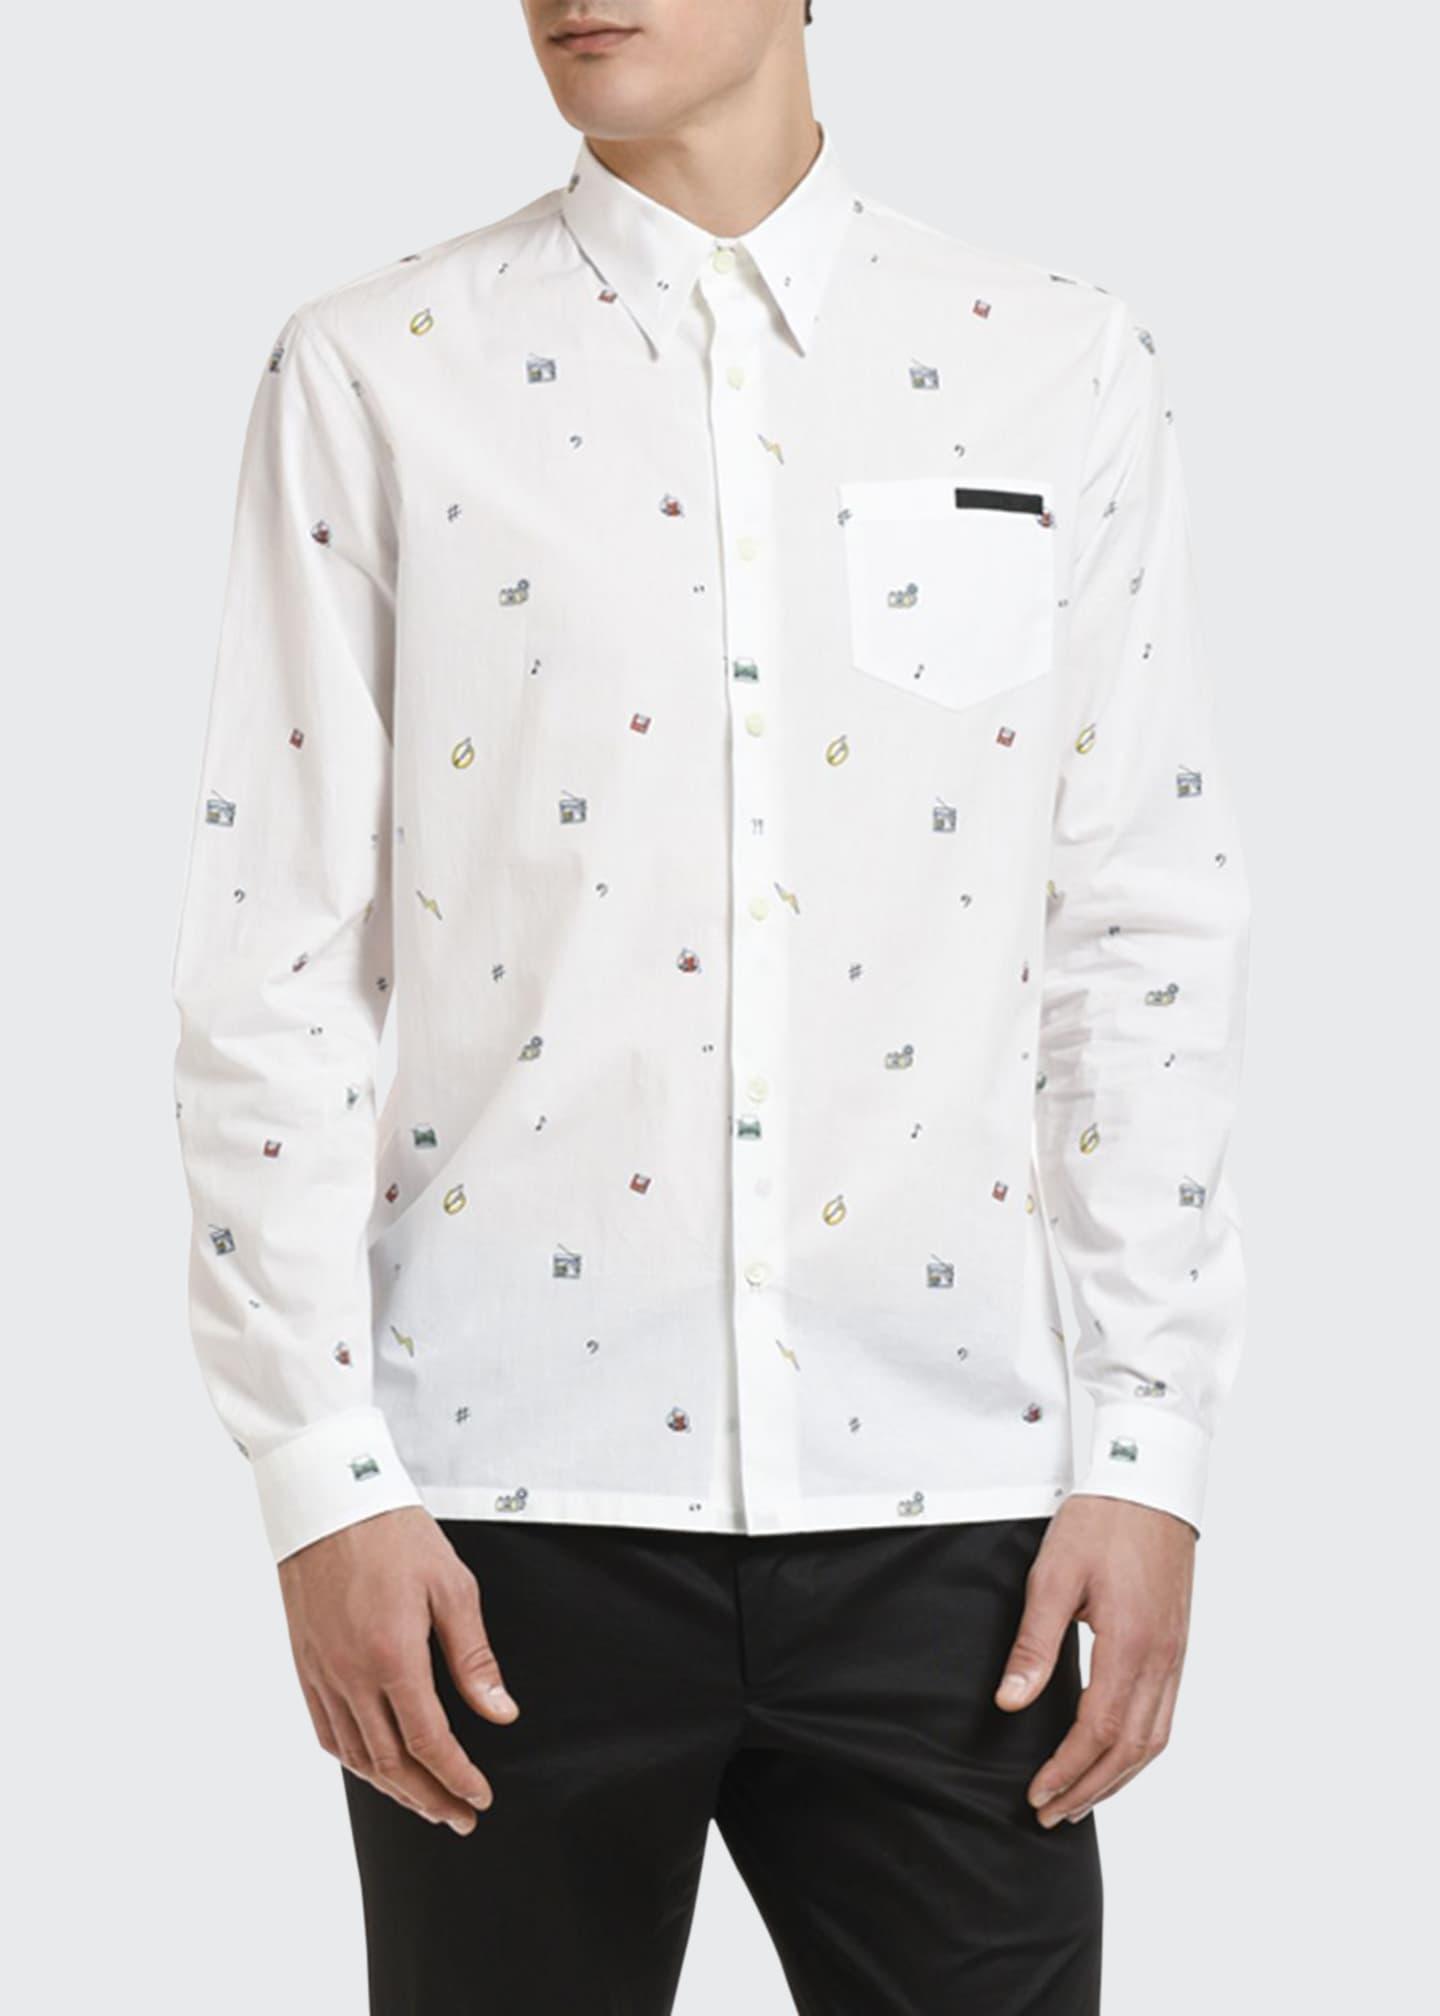 Prada Men's Poplin Toys Point-Collar Sport Shirt